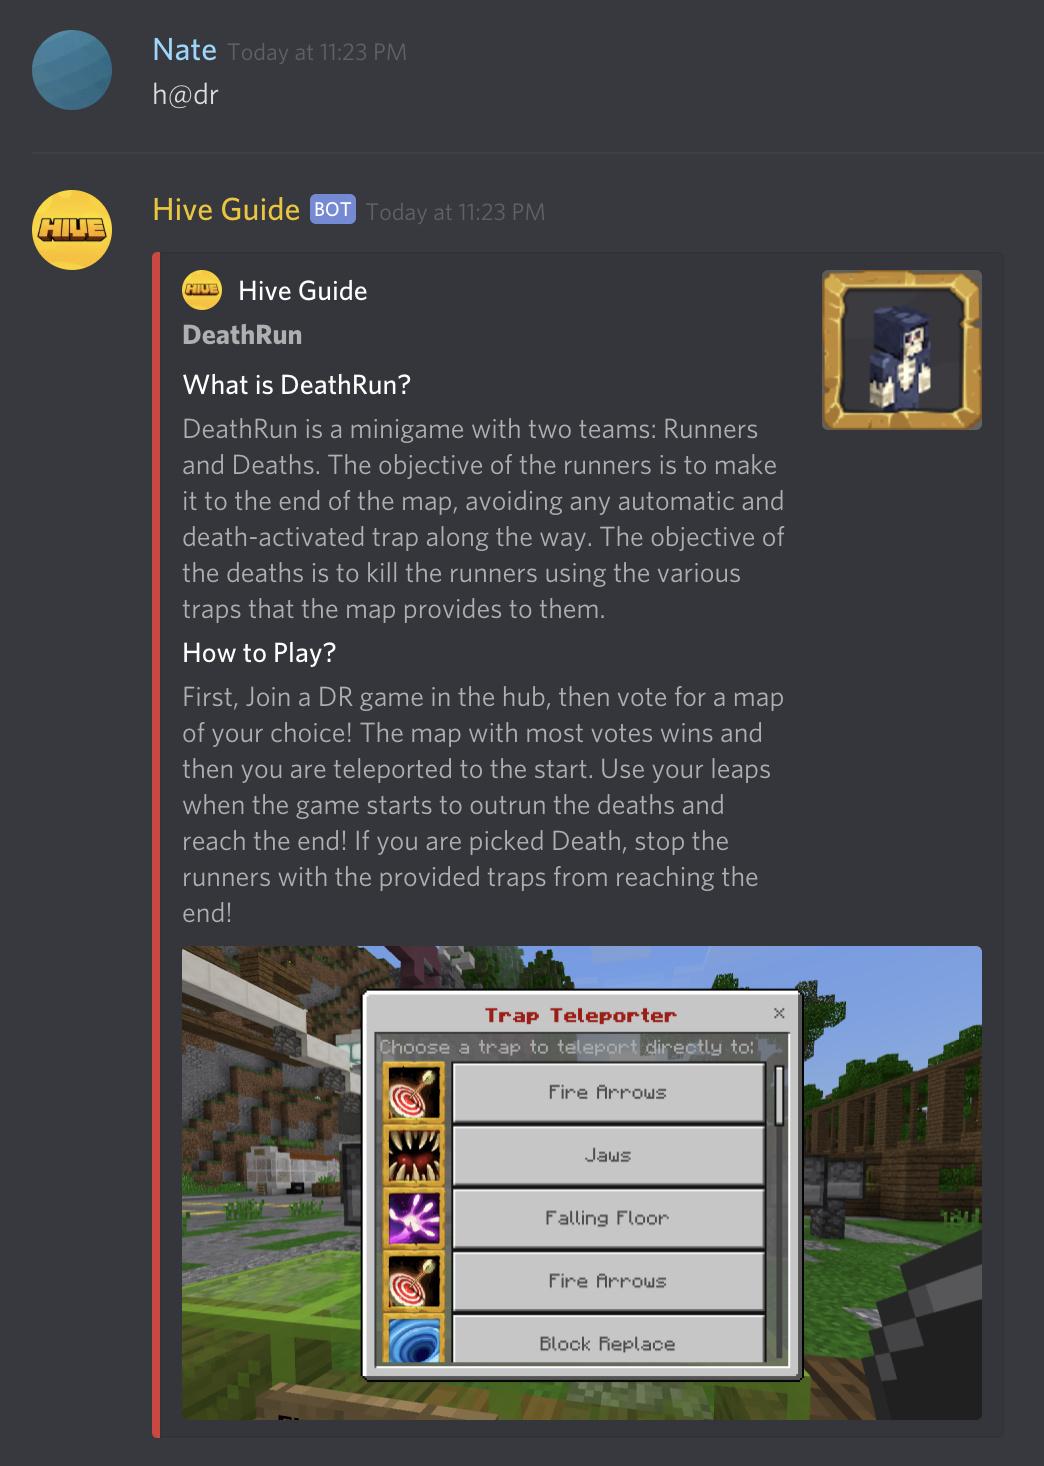 Discord Bot Guide